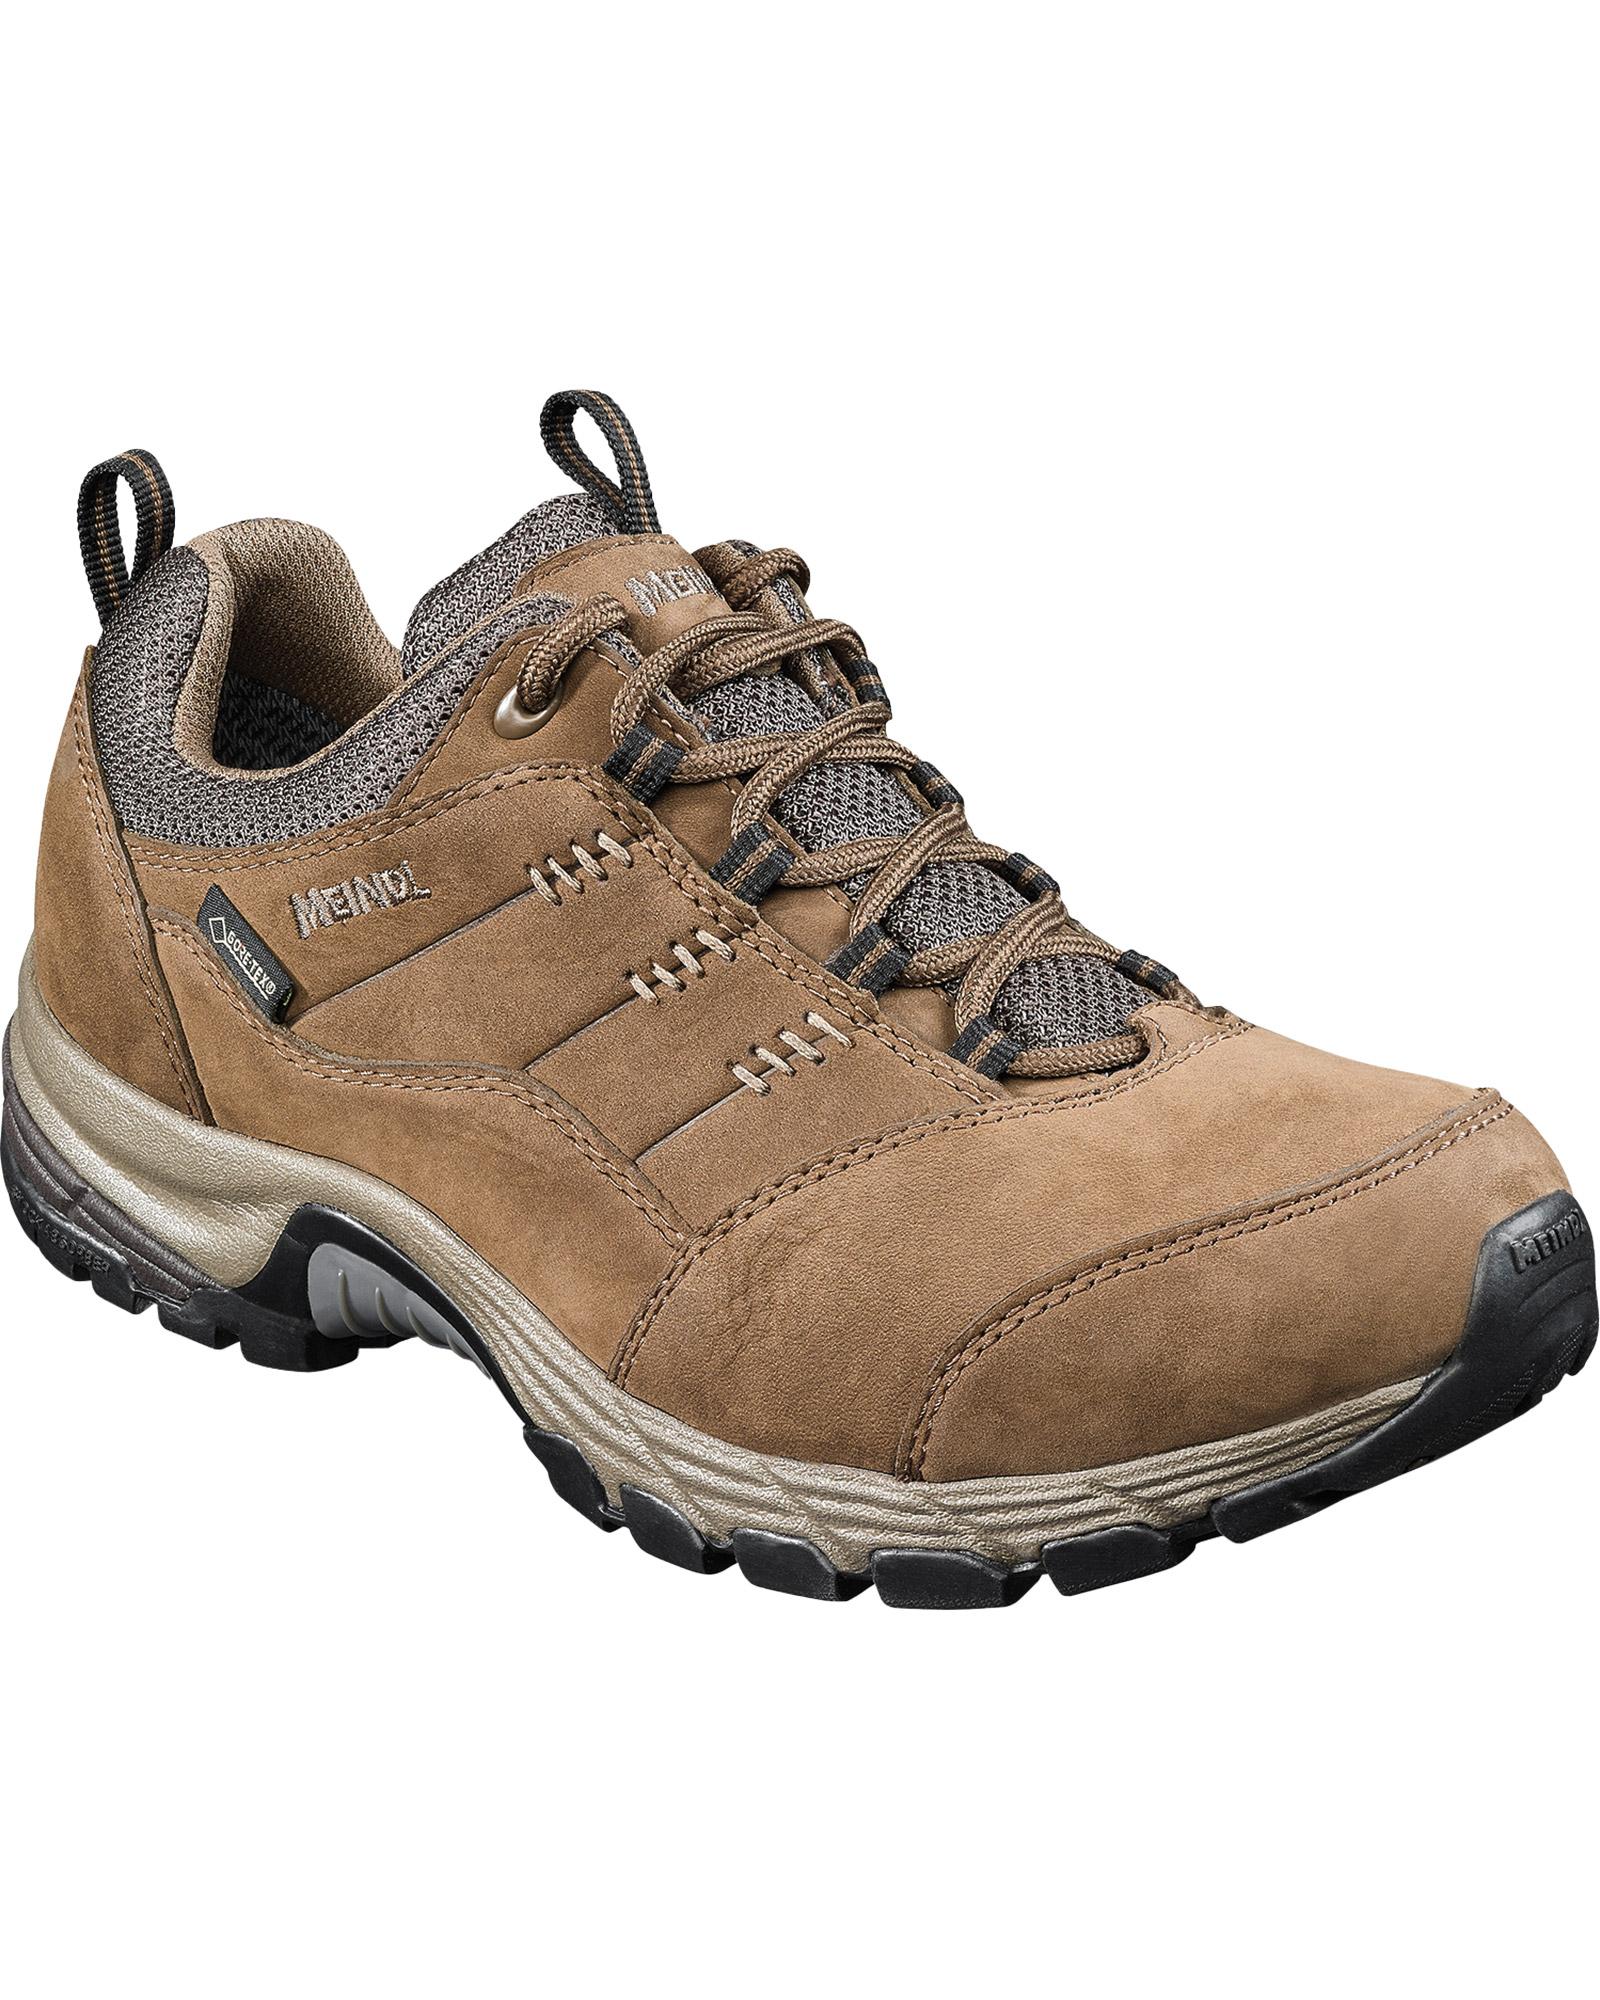 Meindl Women's Philadelphia GORE-TEX Walking Shoes Nutria 0